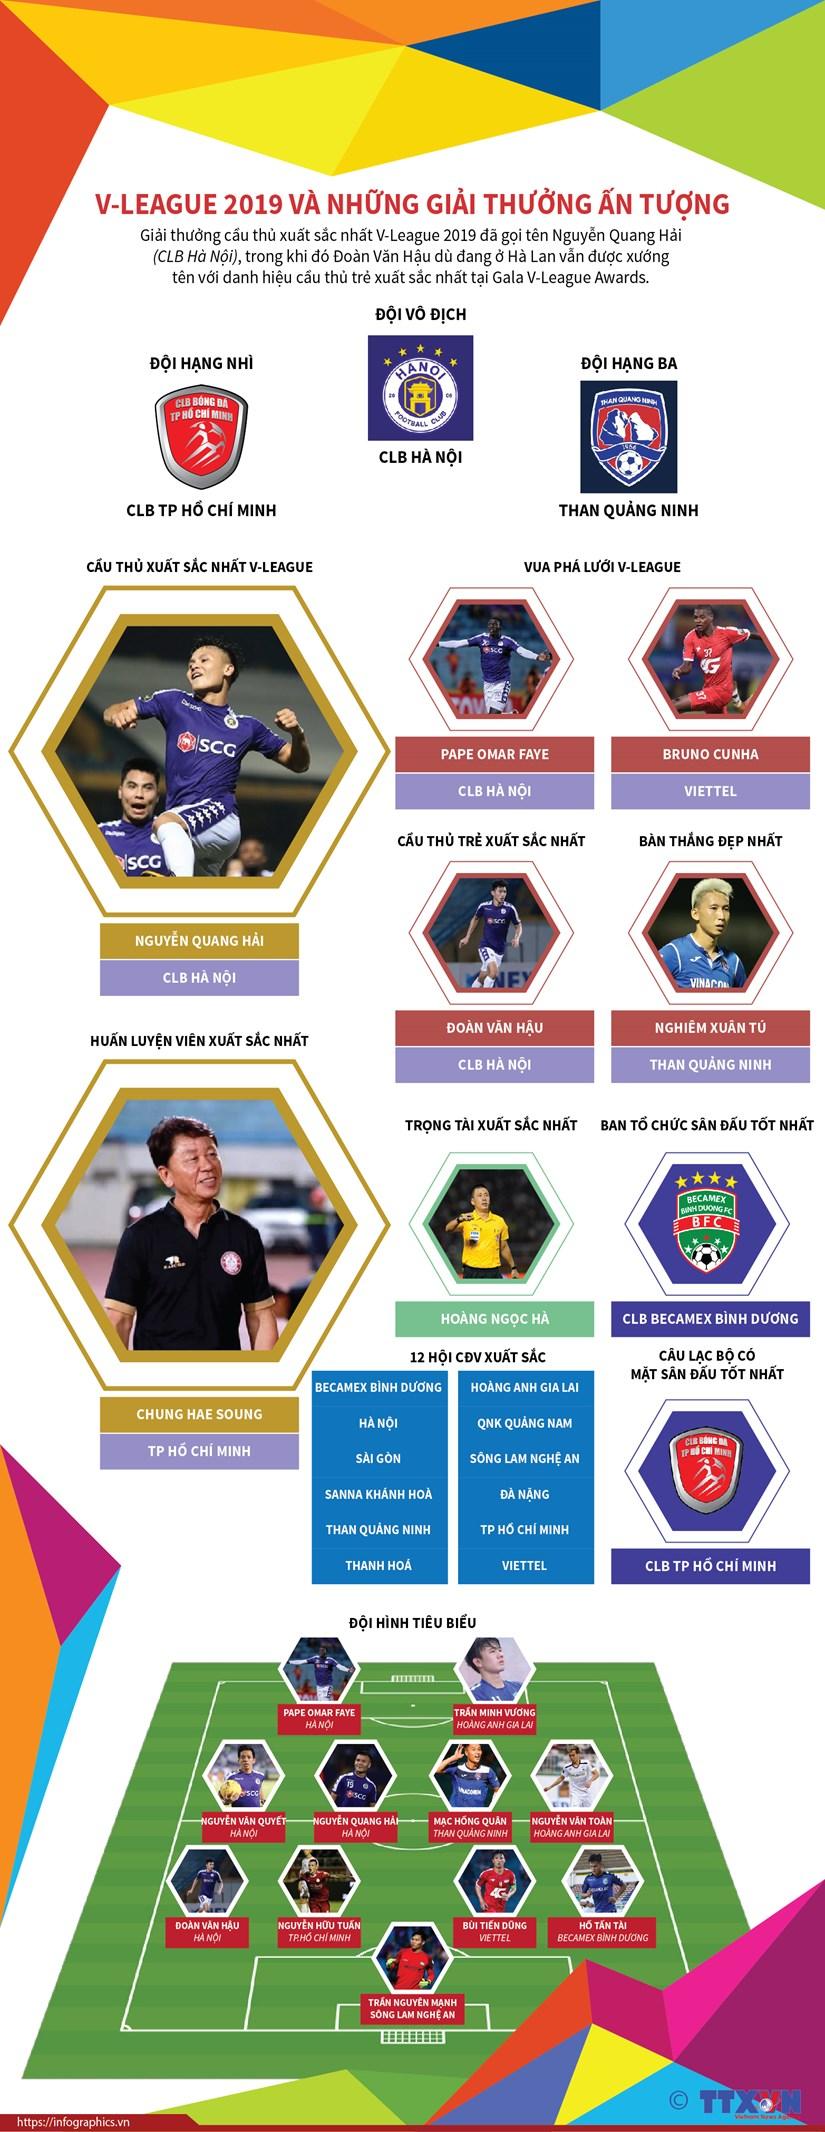 [Infographics] V-League 2019 va nhung giai thuong an tuong hinh anh 1